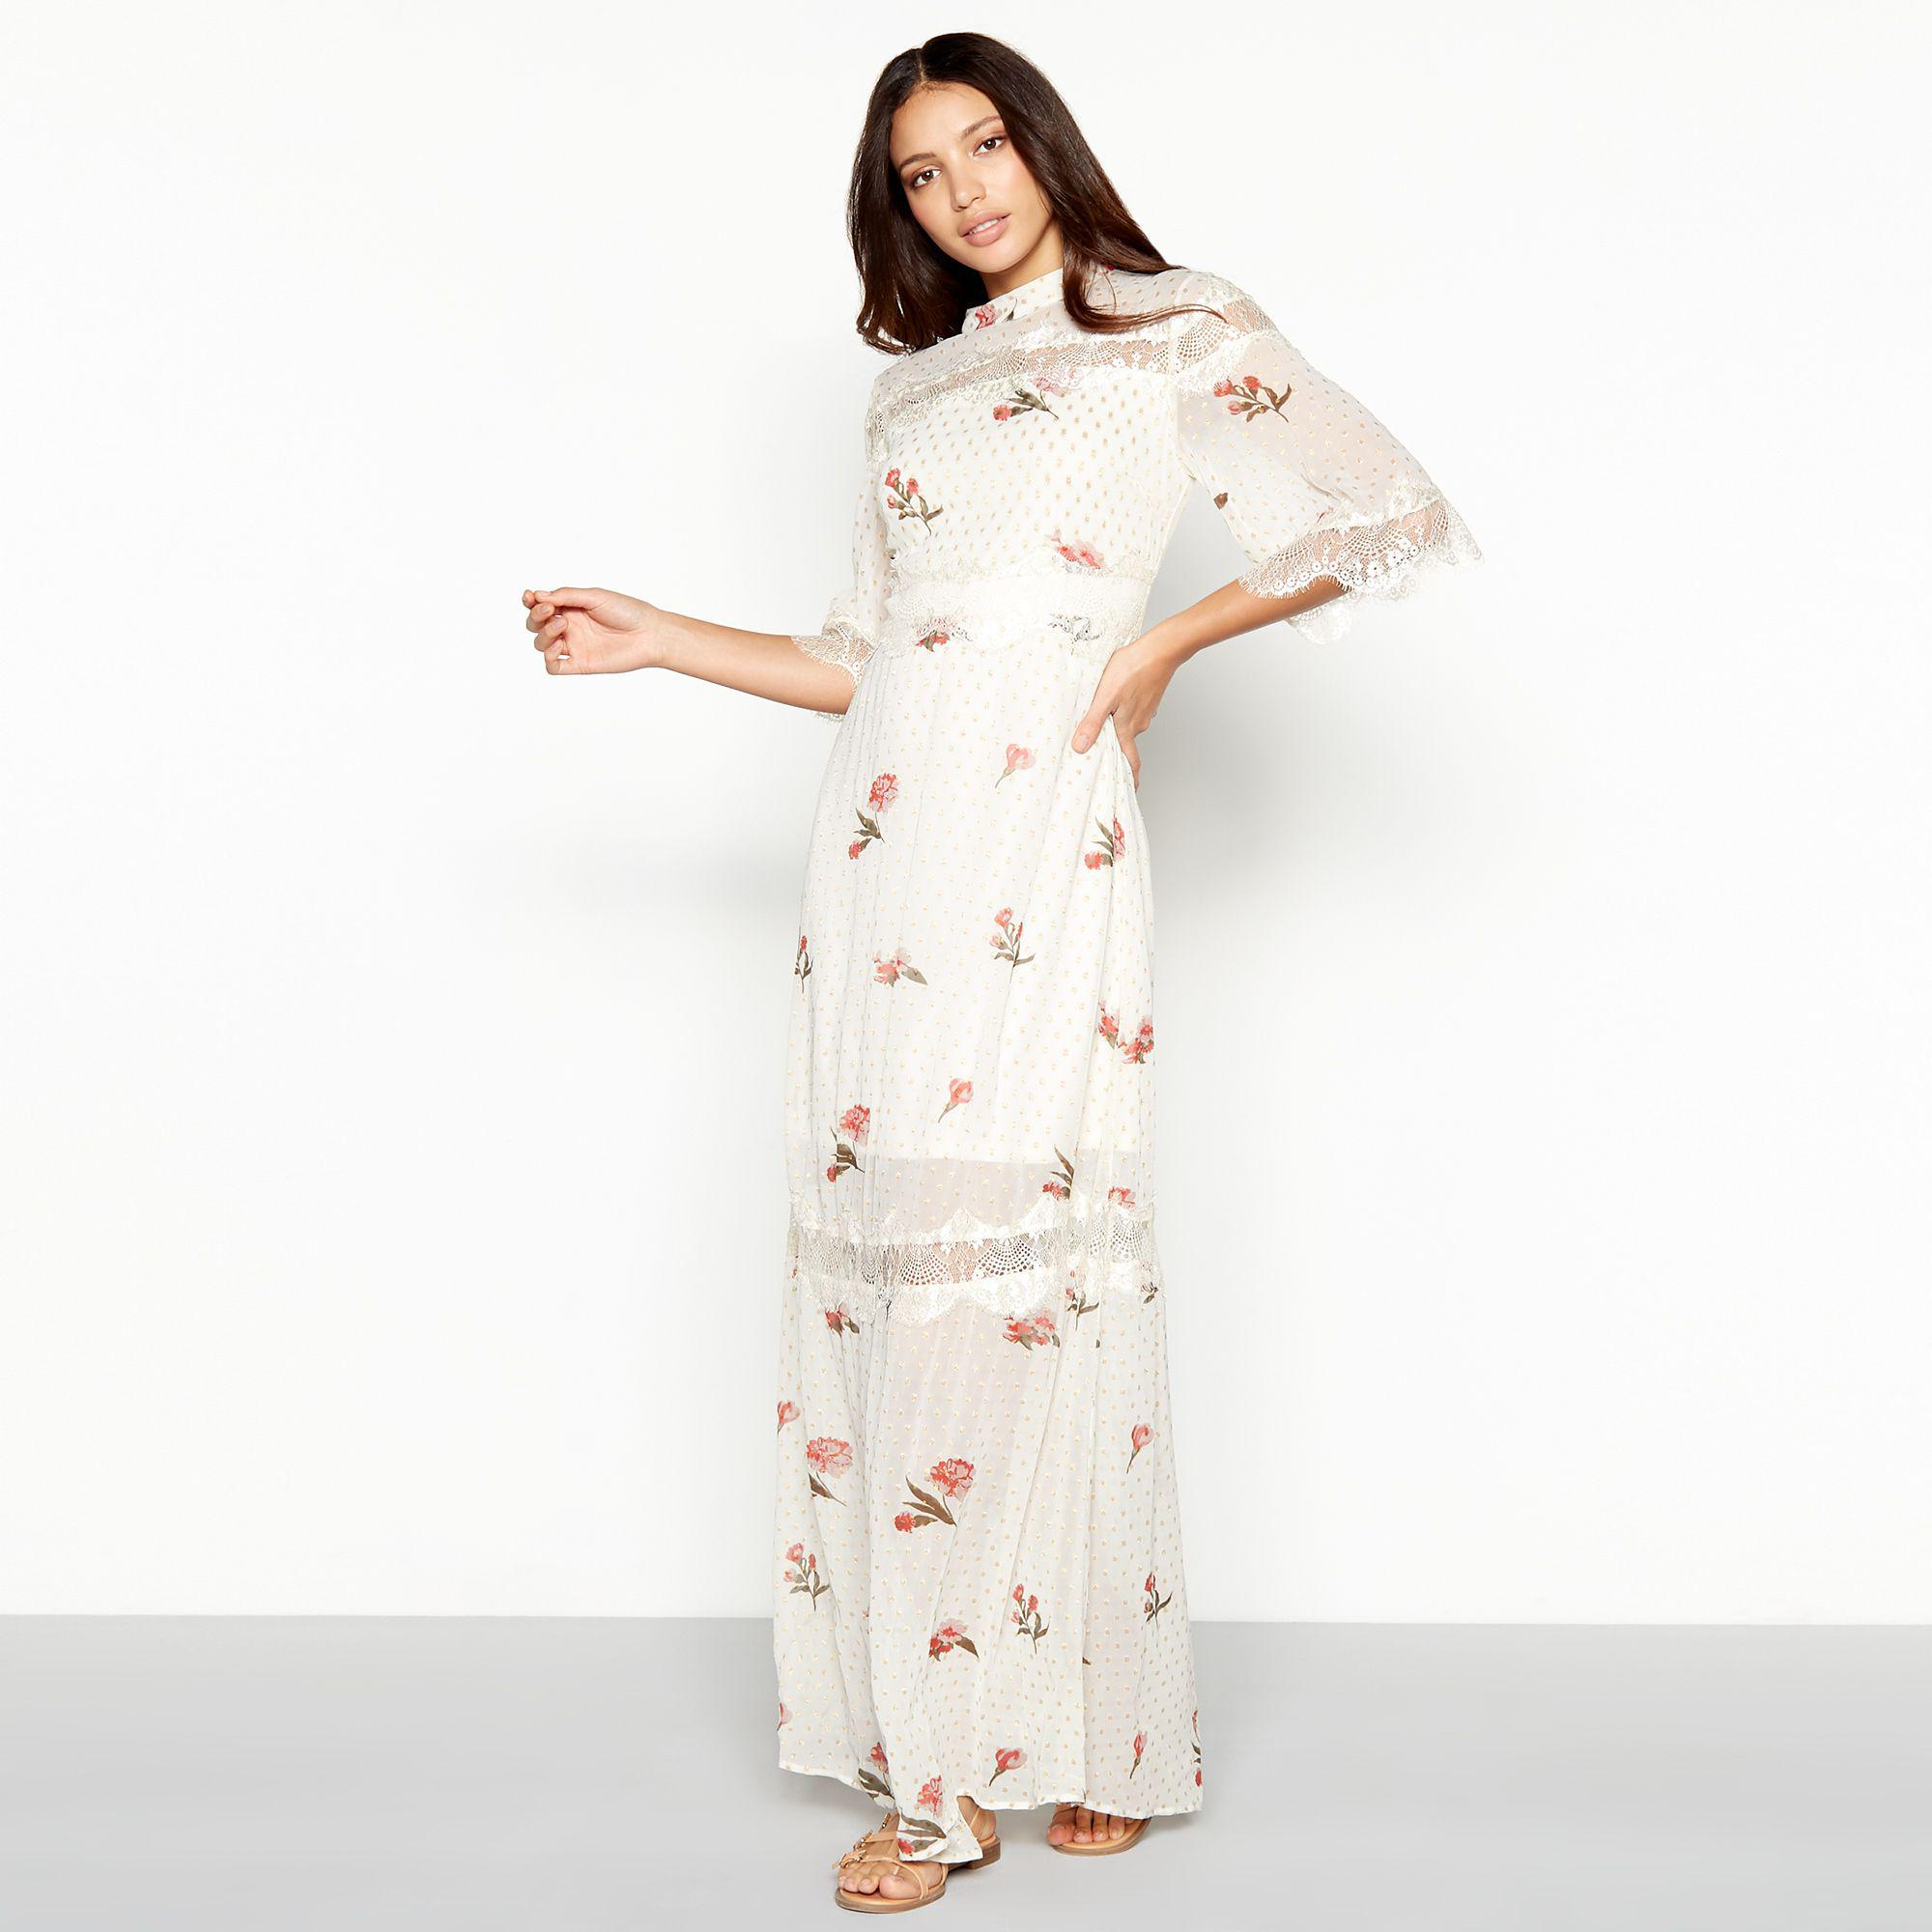 24ec1ad5316f White Chiffon Floral Print Dress | Saddha